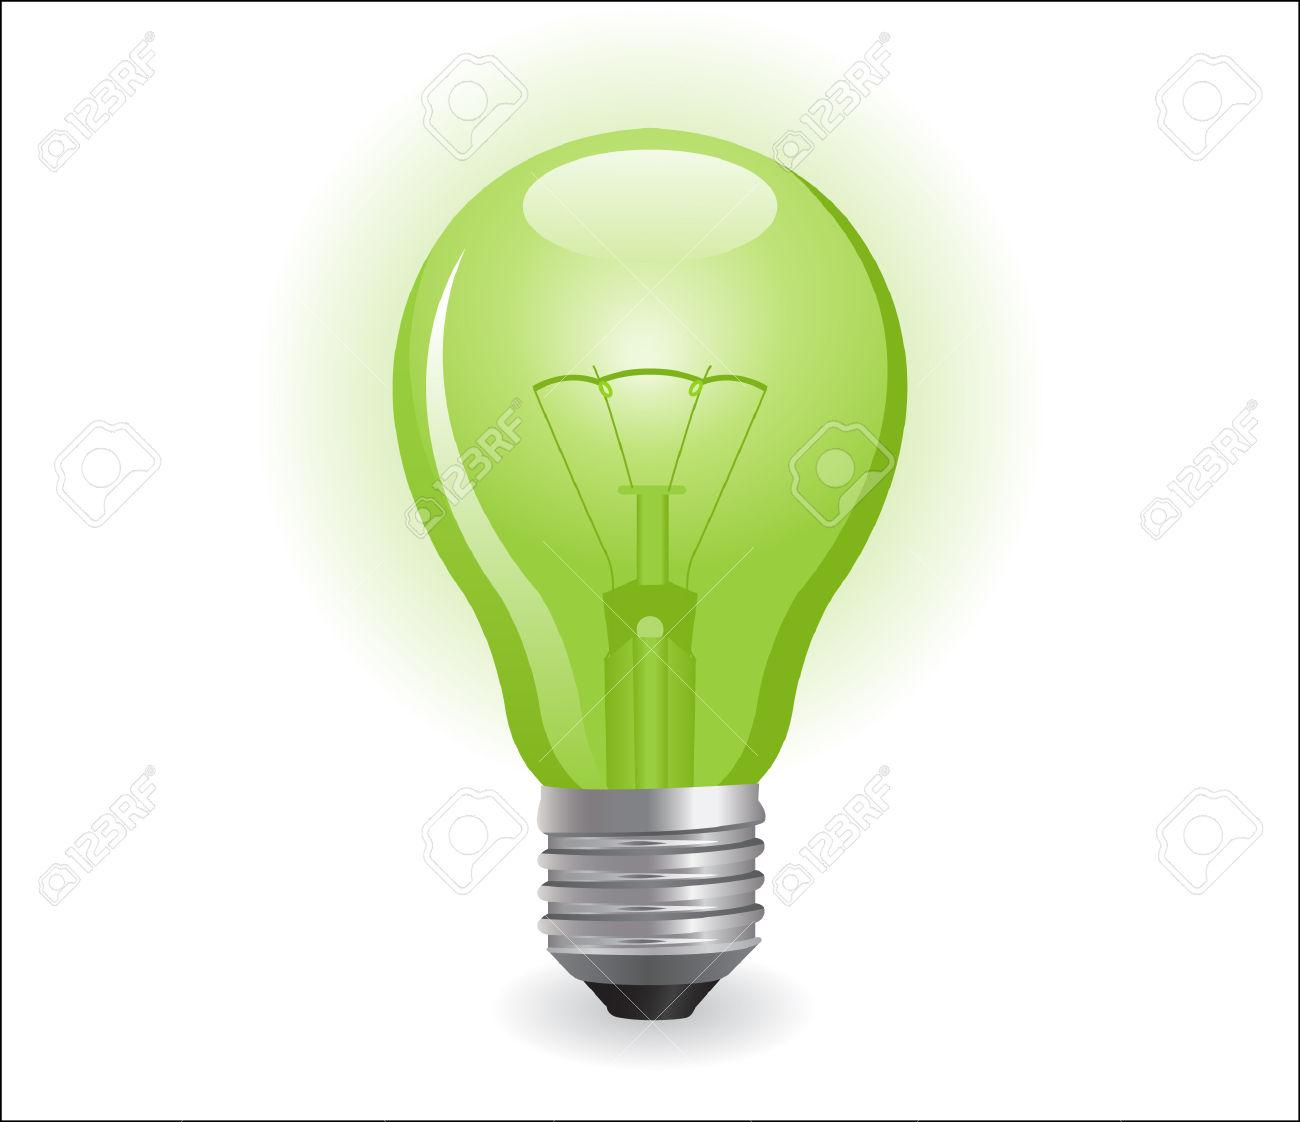 Incandescent Electric Light Bulb Royalty Free Cliparts, Vectors.